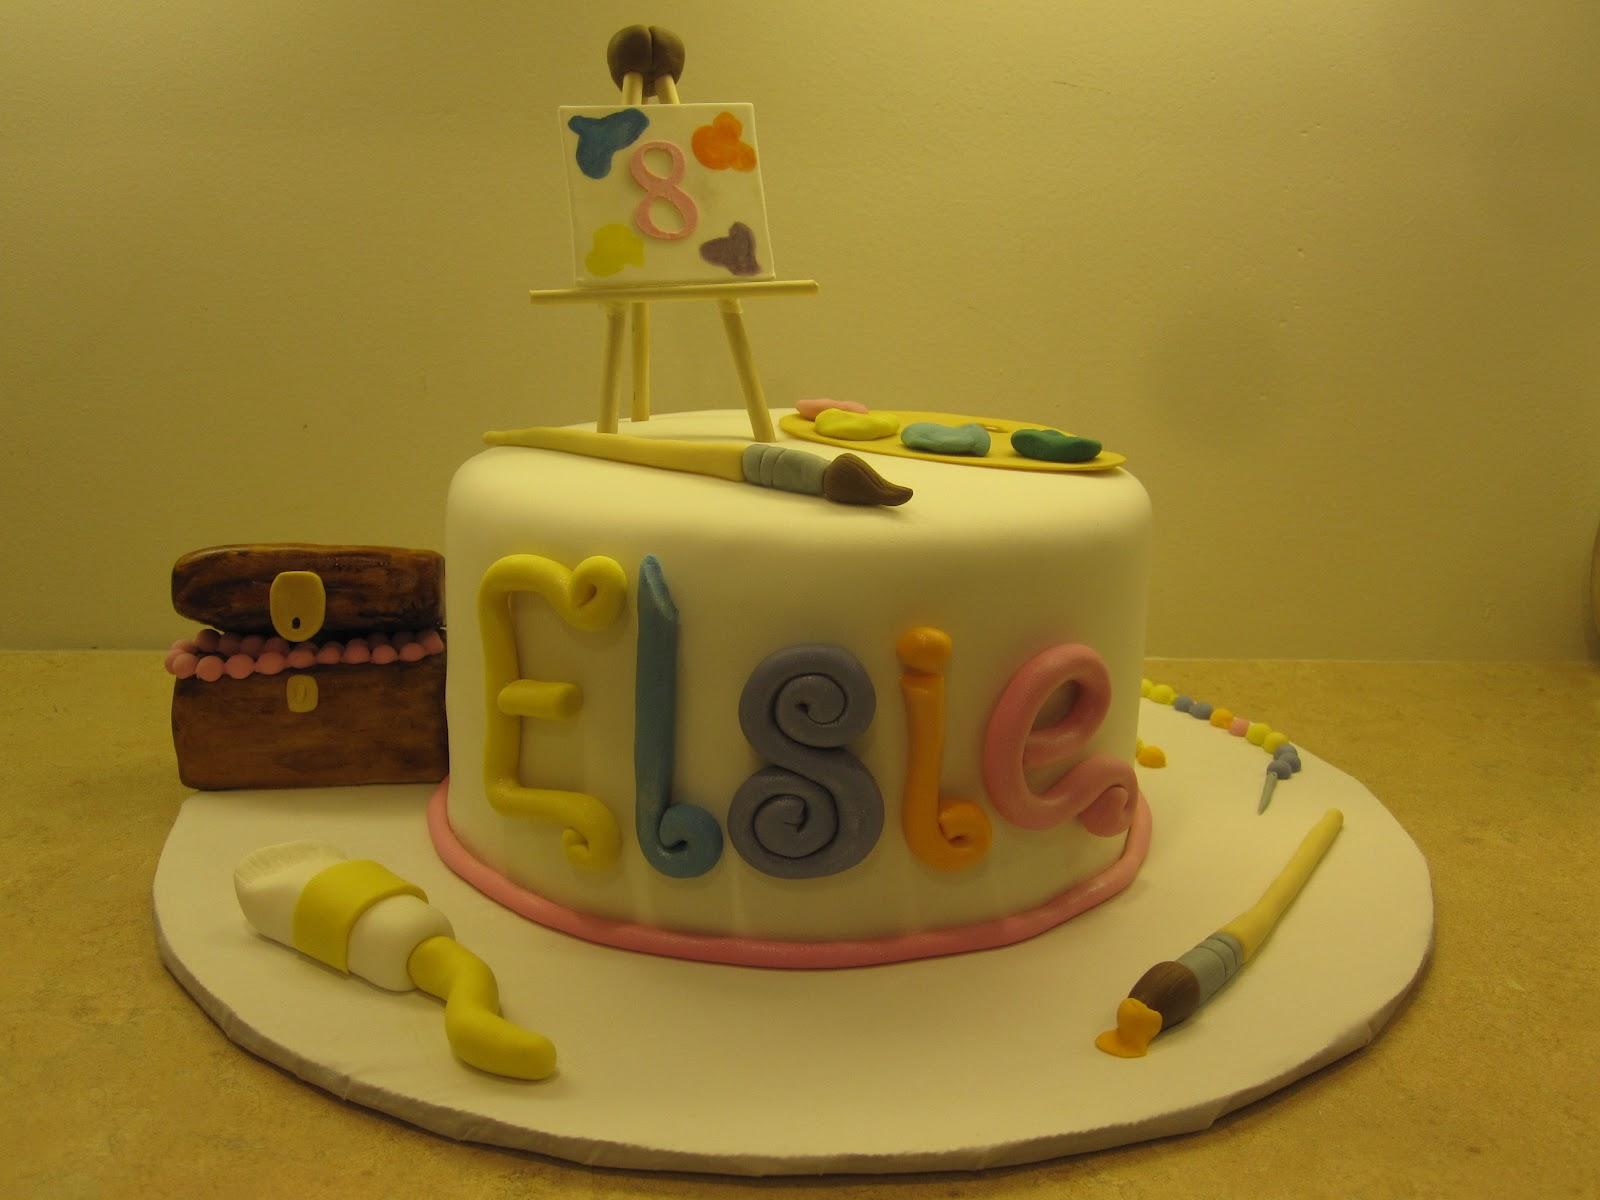 Cake Artist Painter : Artist / Painting Cake